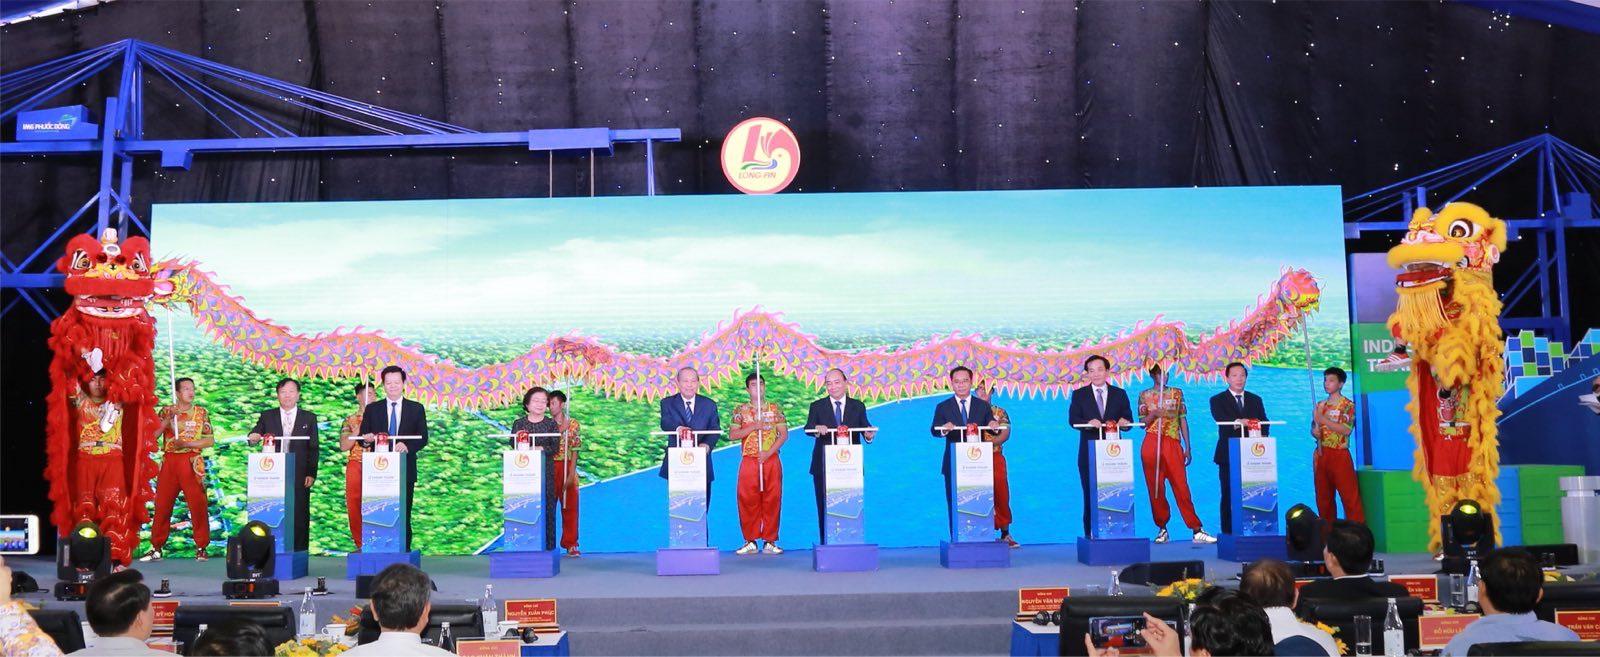 khu cn cau cang phuoc dong vinh du tiep don thu tuong tai le khanh thanh